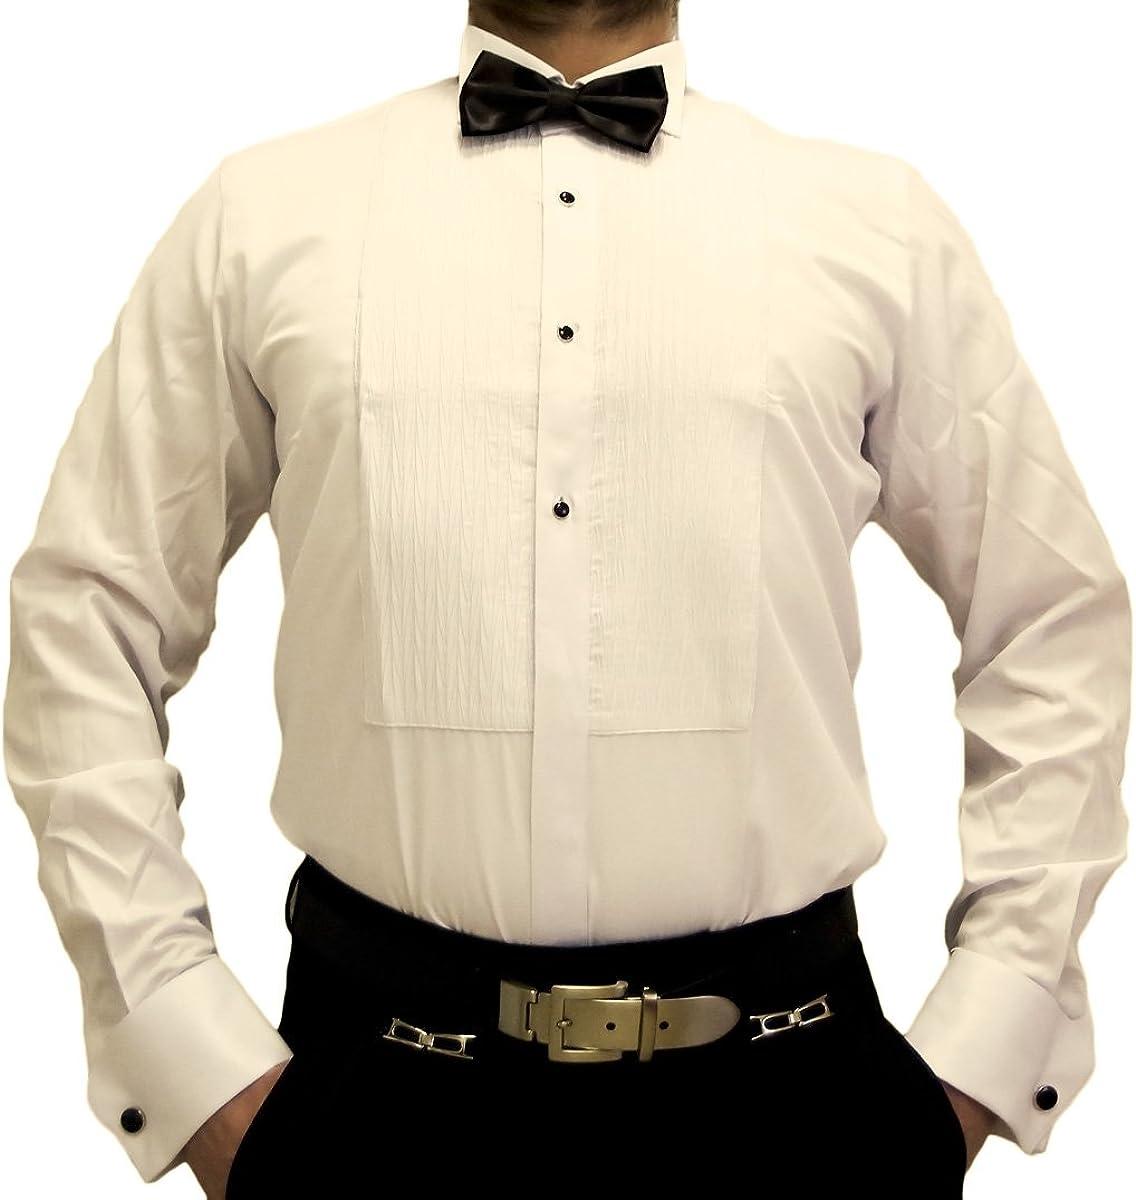 Farrabi - Camisa Formal - Básico - Cuello ala - Manga Larga ...